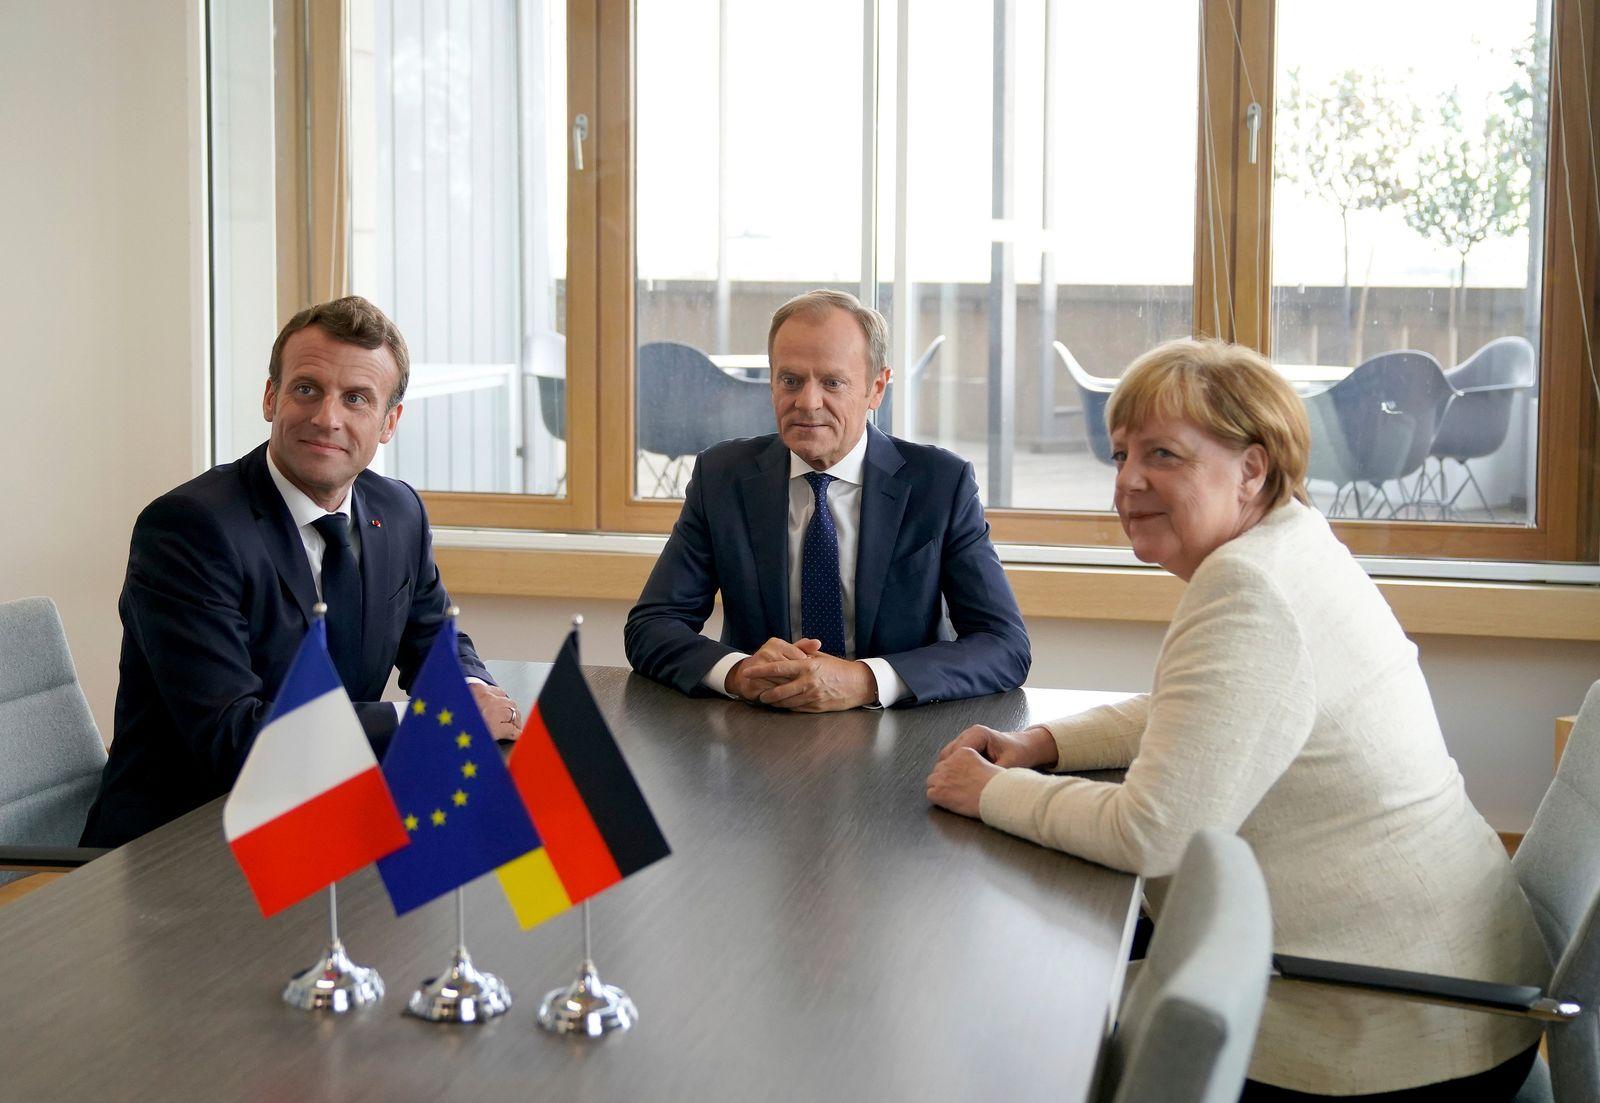 EU-Gipfel in Brüssel Angela Merkel Emmanuel Macron Donald Tusk